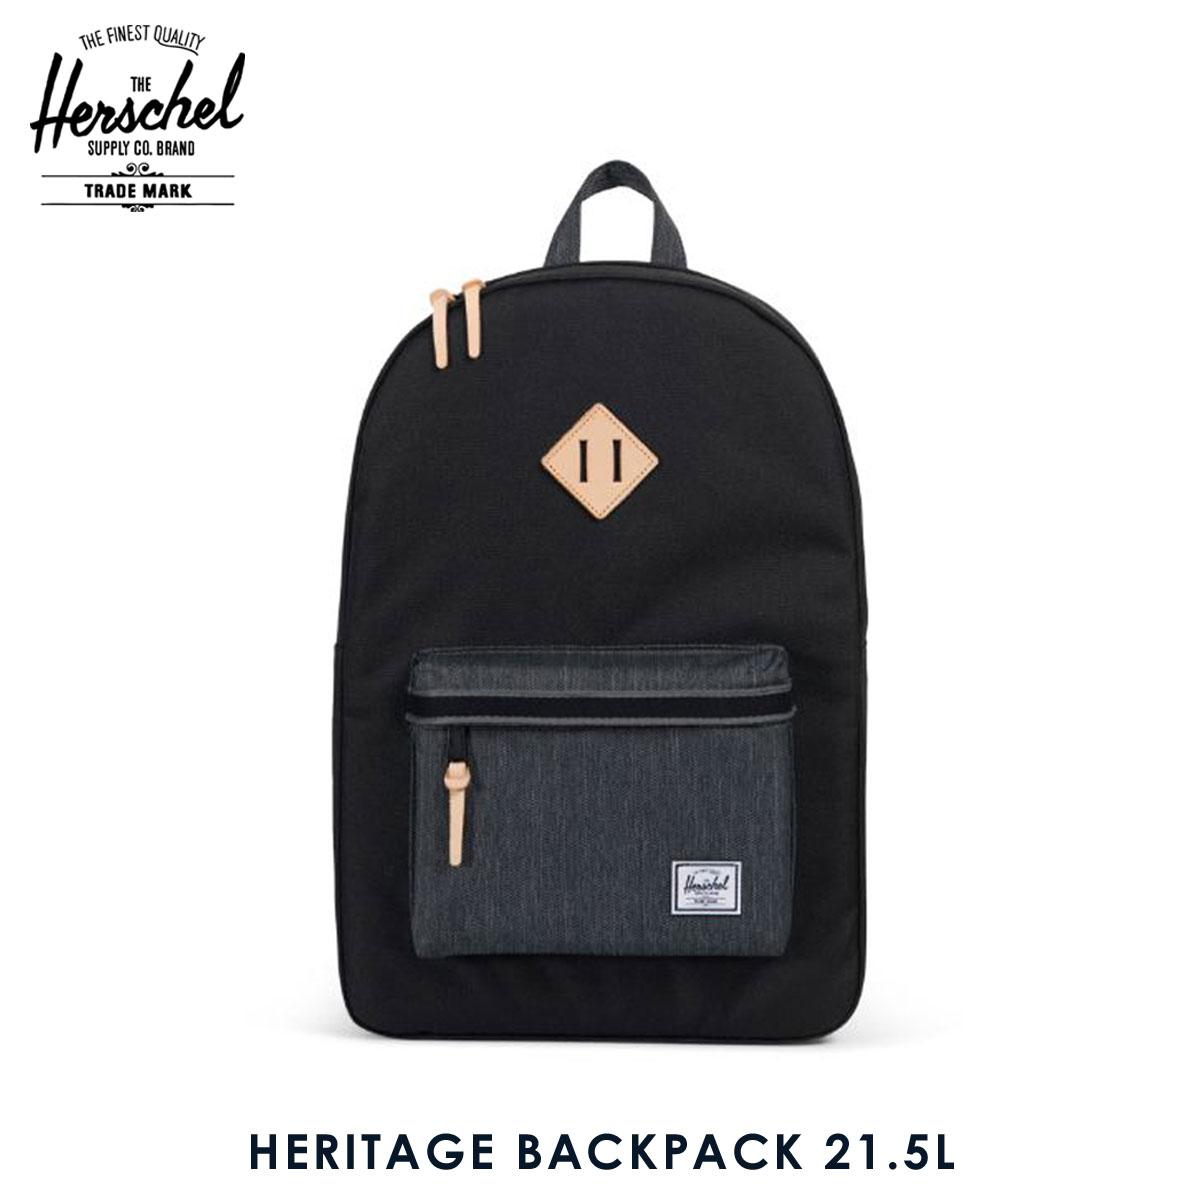 2b27852c0c Hershel supply Herschel Supply regular store backpack rucksack HERITAGE  BACKPACK 10007-02099-OS BLACK BLACK DENIM